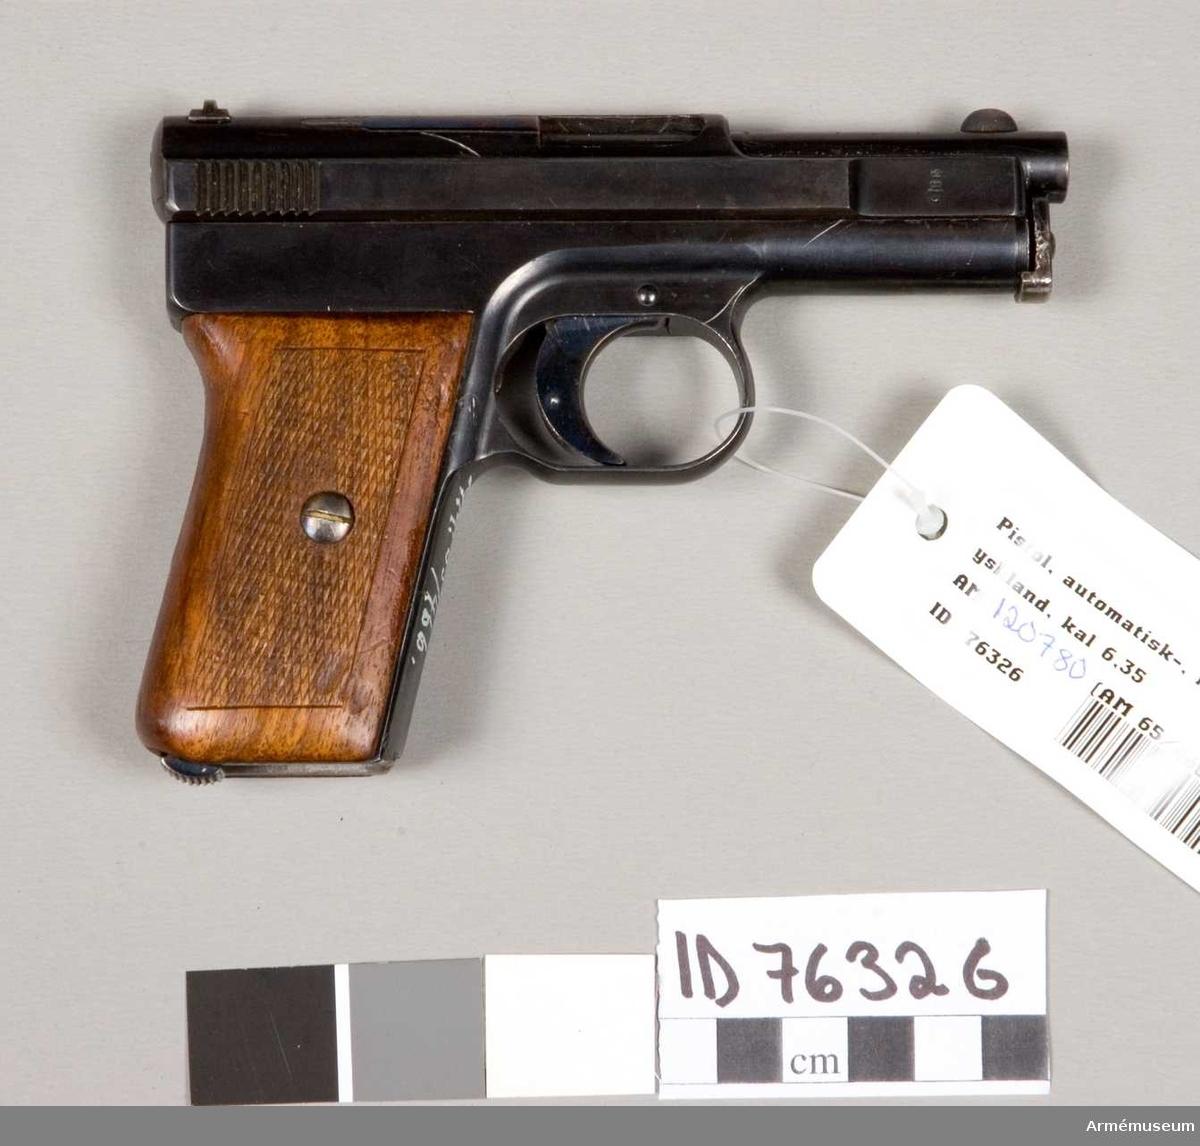 Grupp E III. Automatpistol Mauser kal 25 (6,35 mm). Mekanismen rostskadad. Magasin saknas.